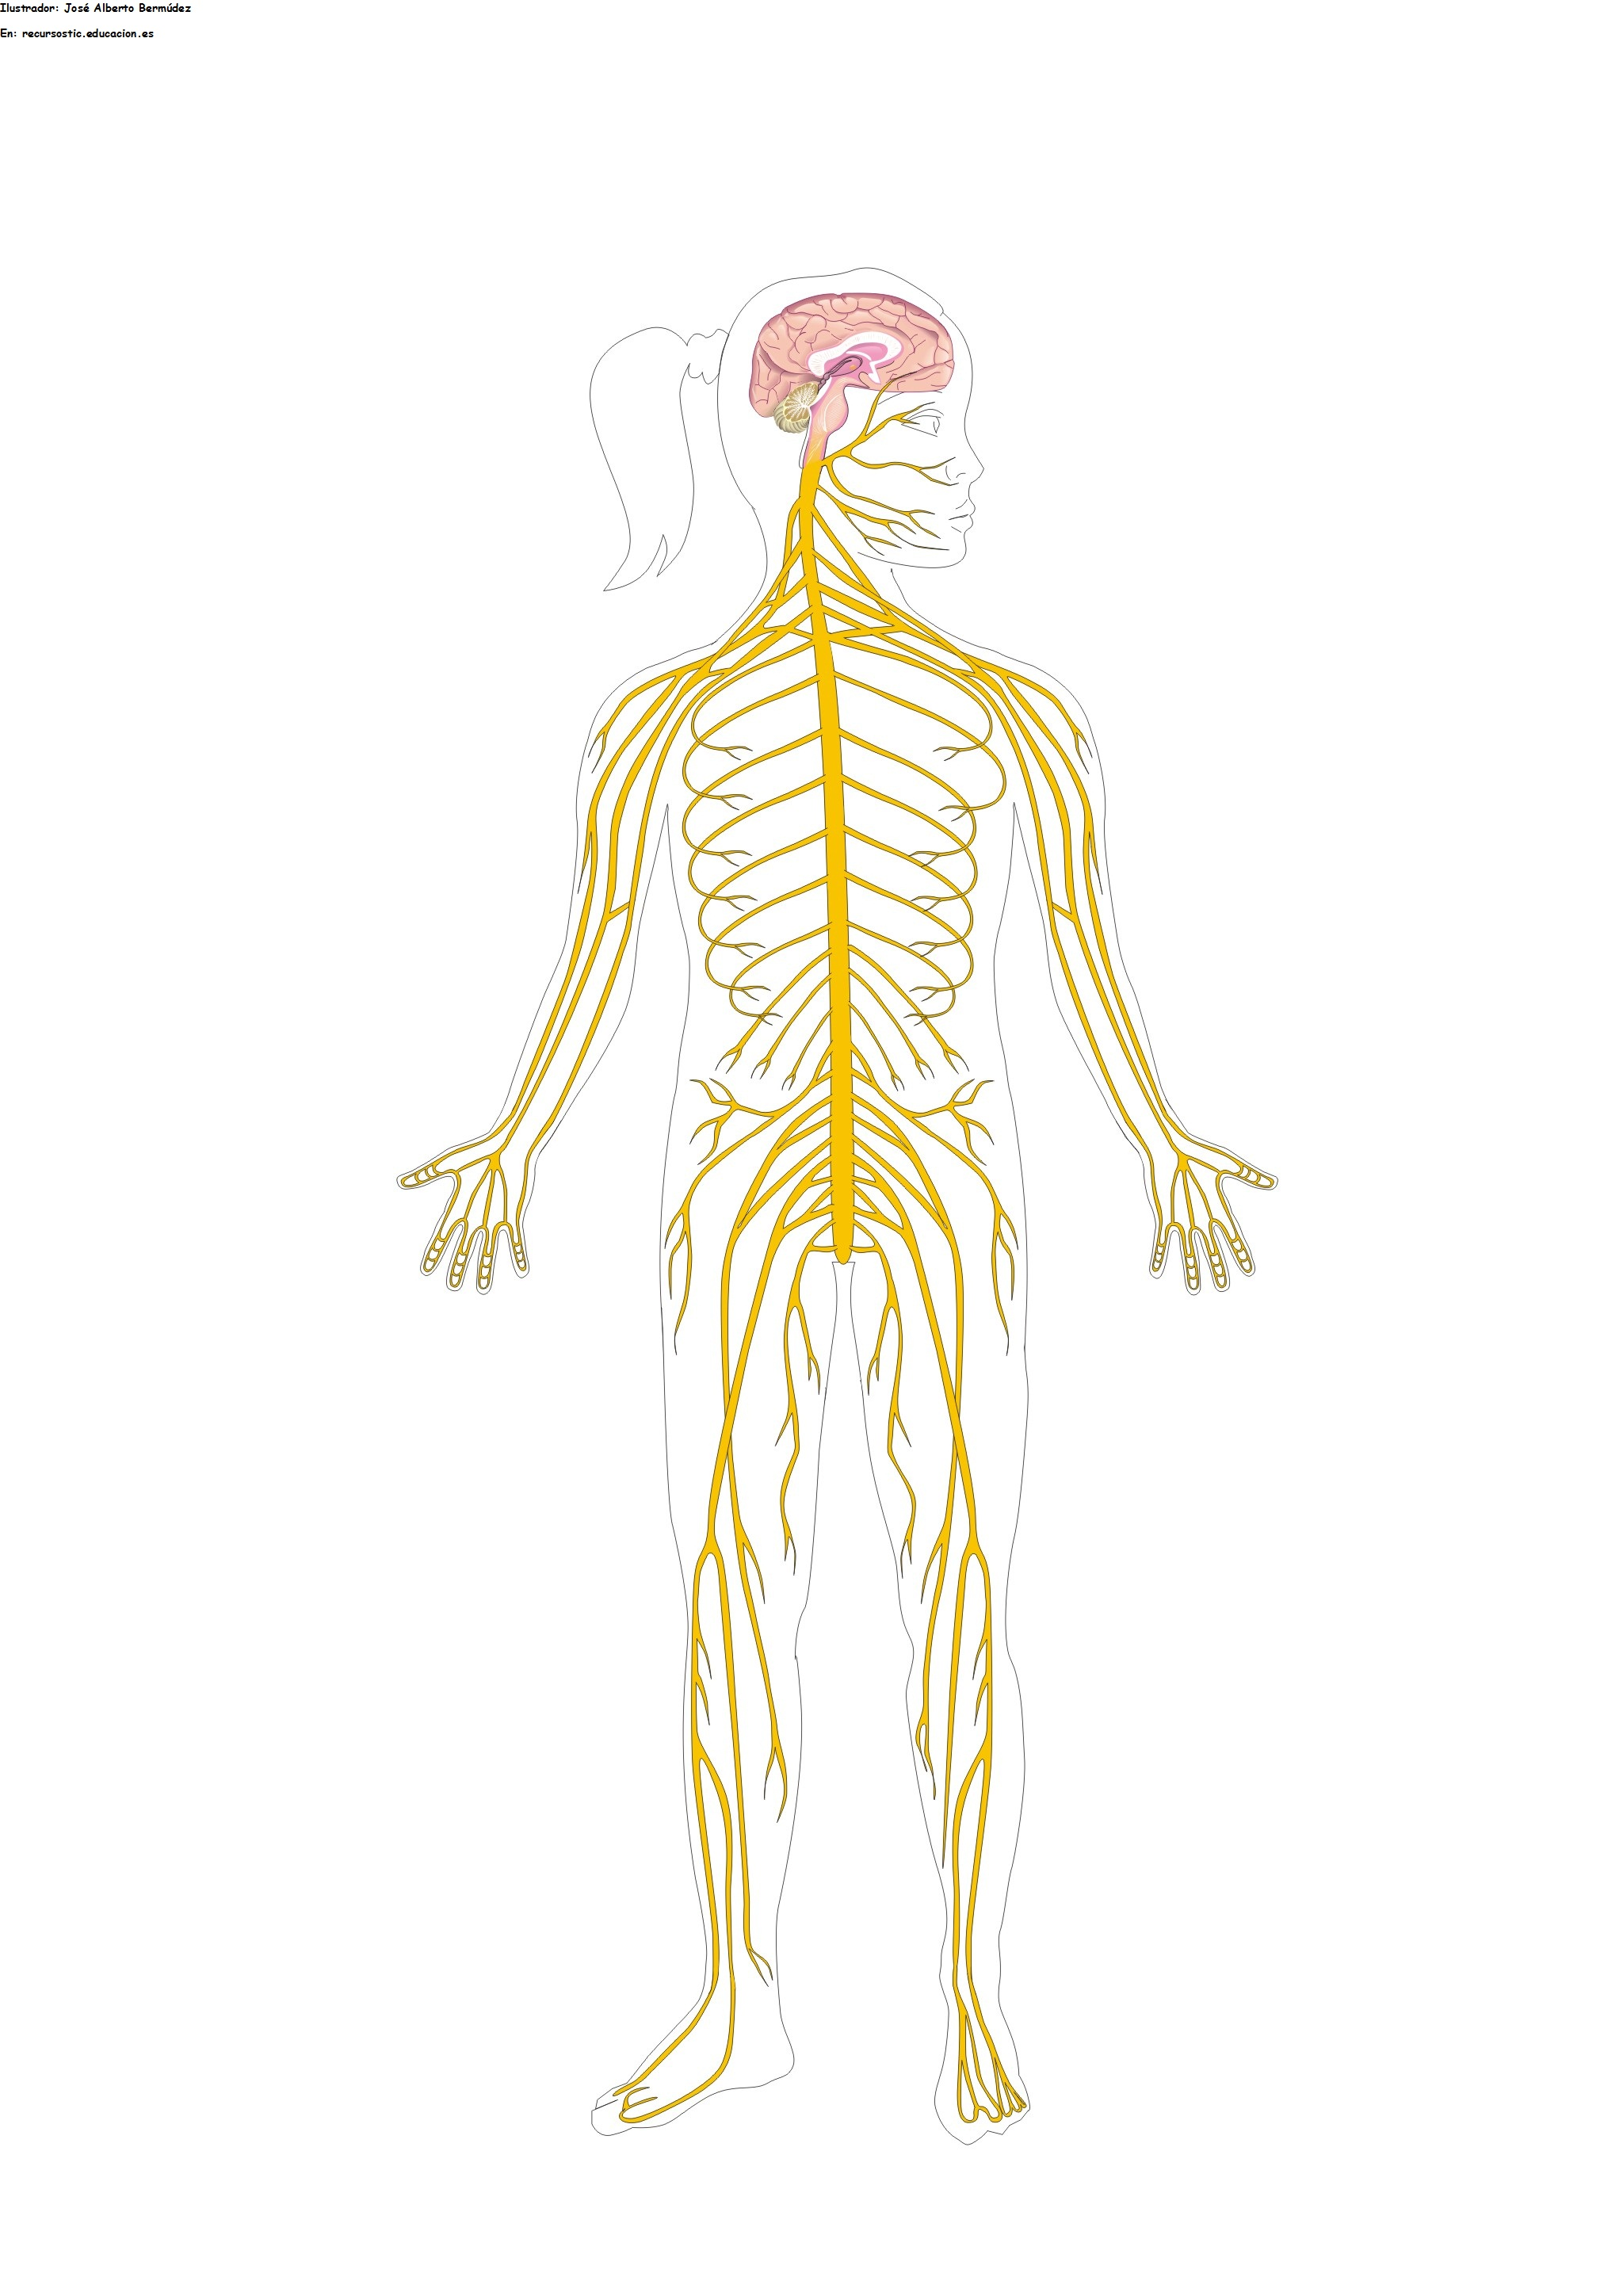 Sistema nervioso mudo